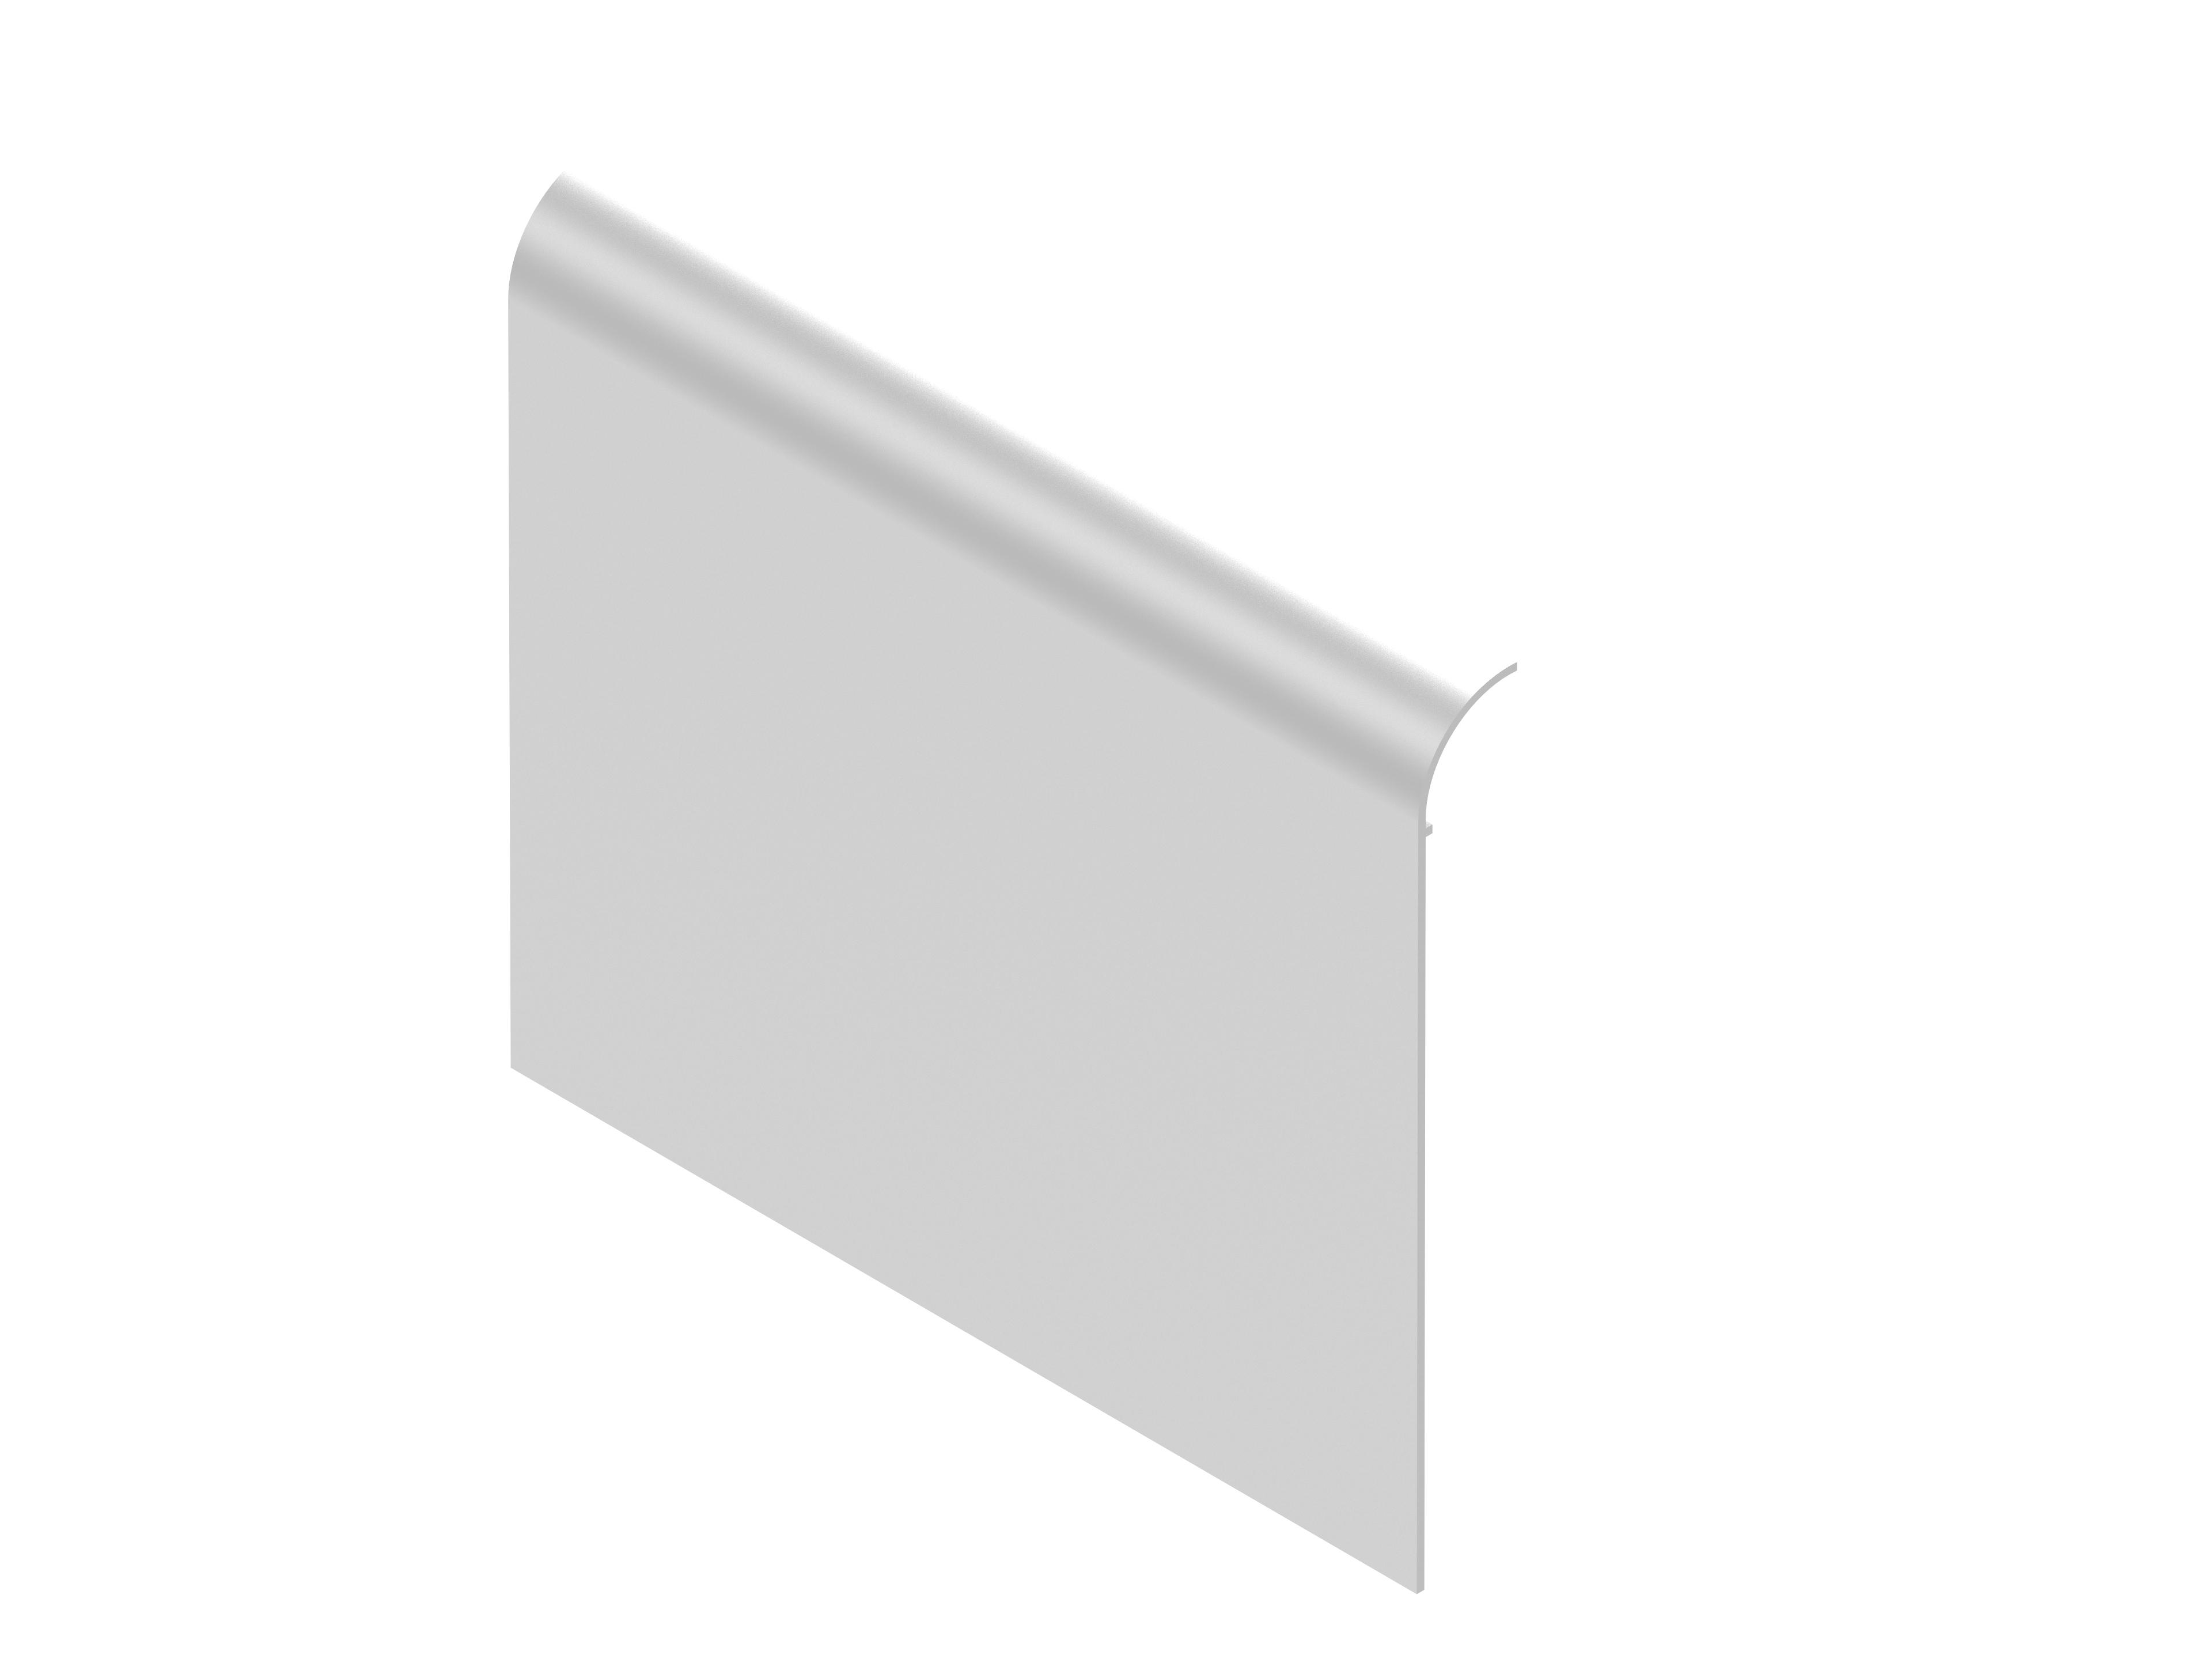 Sign Frame Aluminium Extrusion Modular Sign Header (3600mm)